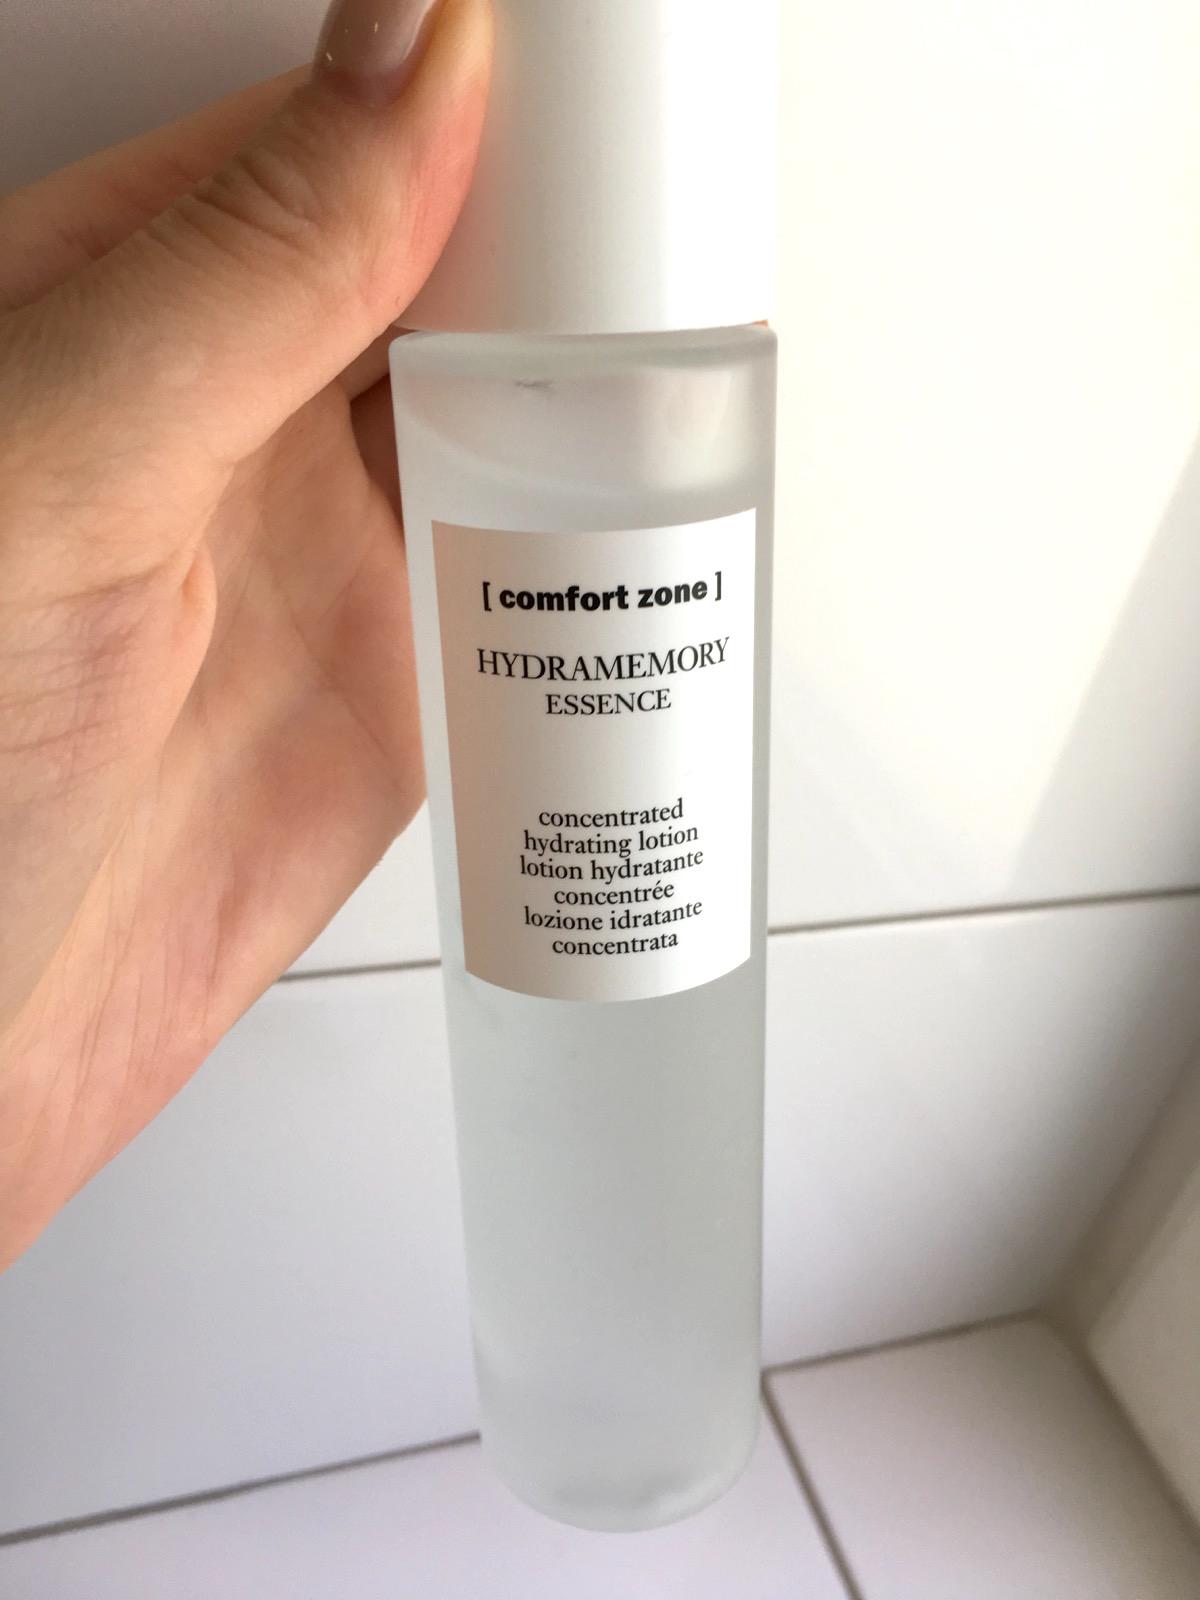 Comfort Zone Hydramemory essence lotion, skönhetssnack.se IMG_7121